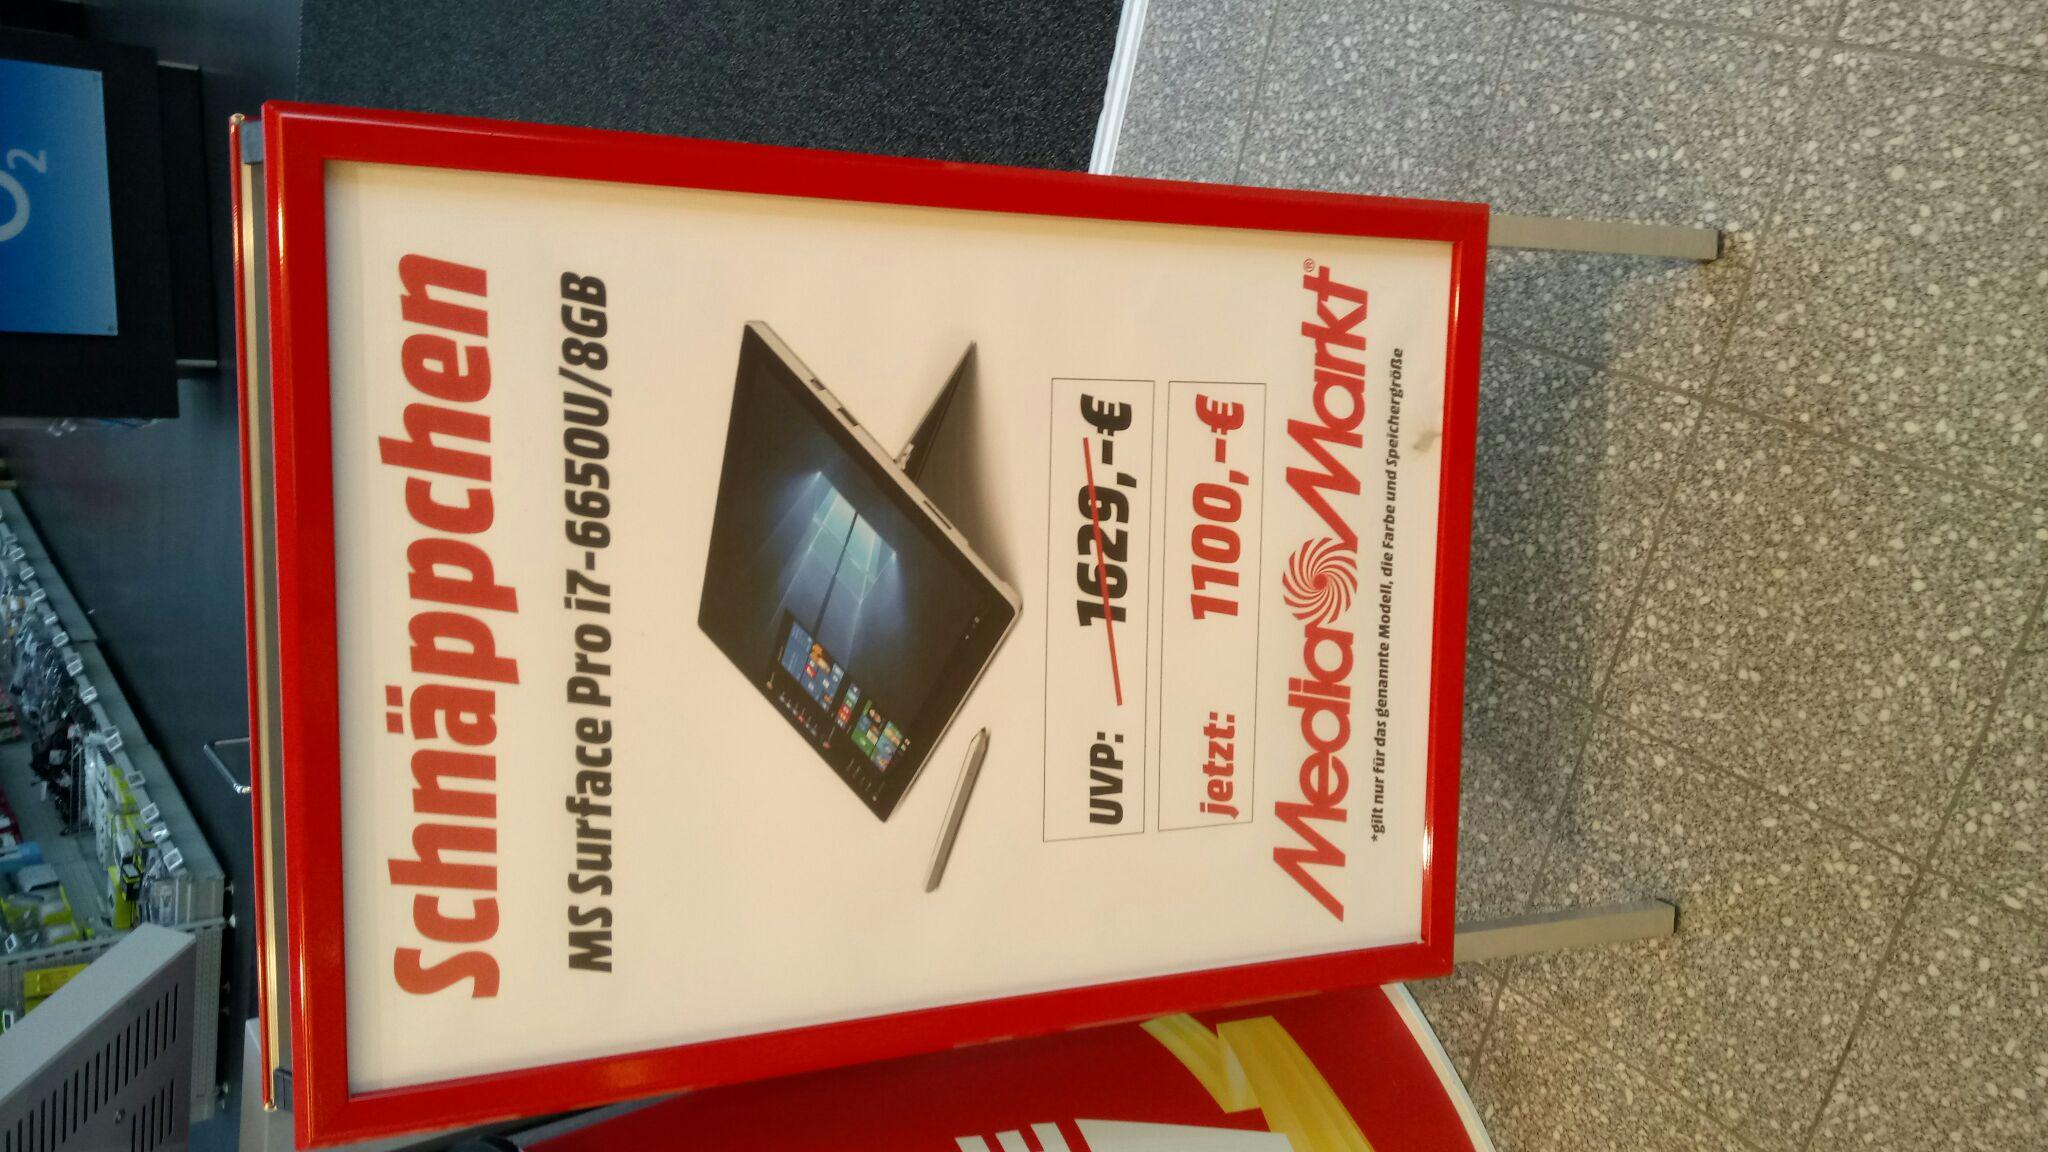 Microsoft surface Pro i7 / 8gb - Lokal Media Markt. (21244 Buchholz)